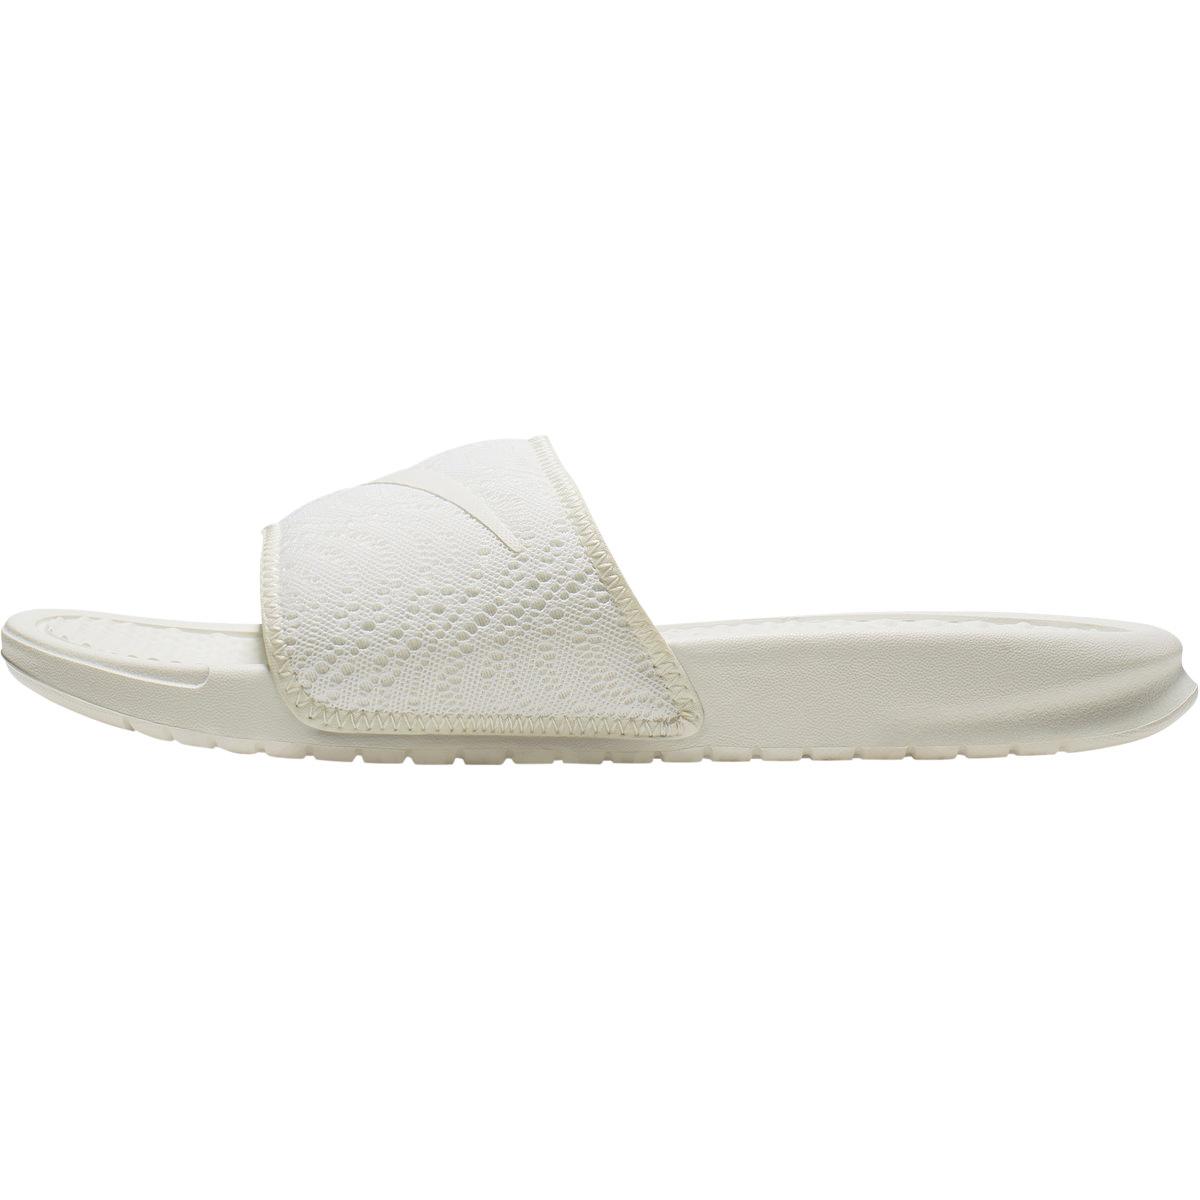 Nike Benassi Just Do It Textile SE Badesandaler Dame